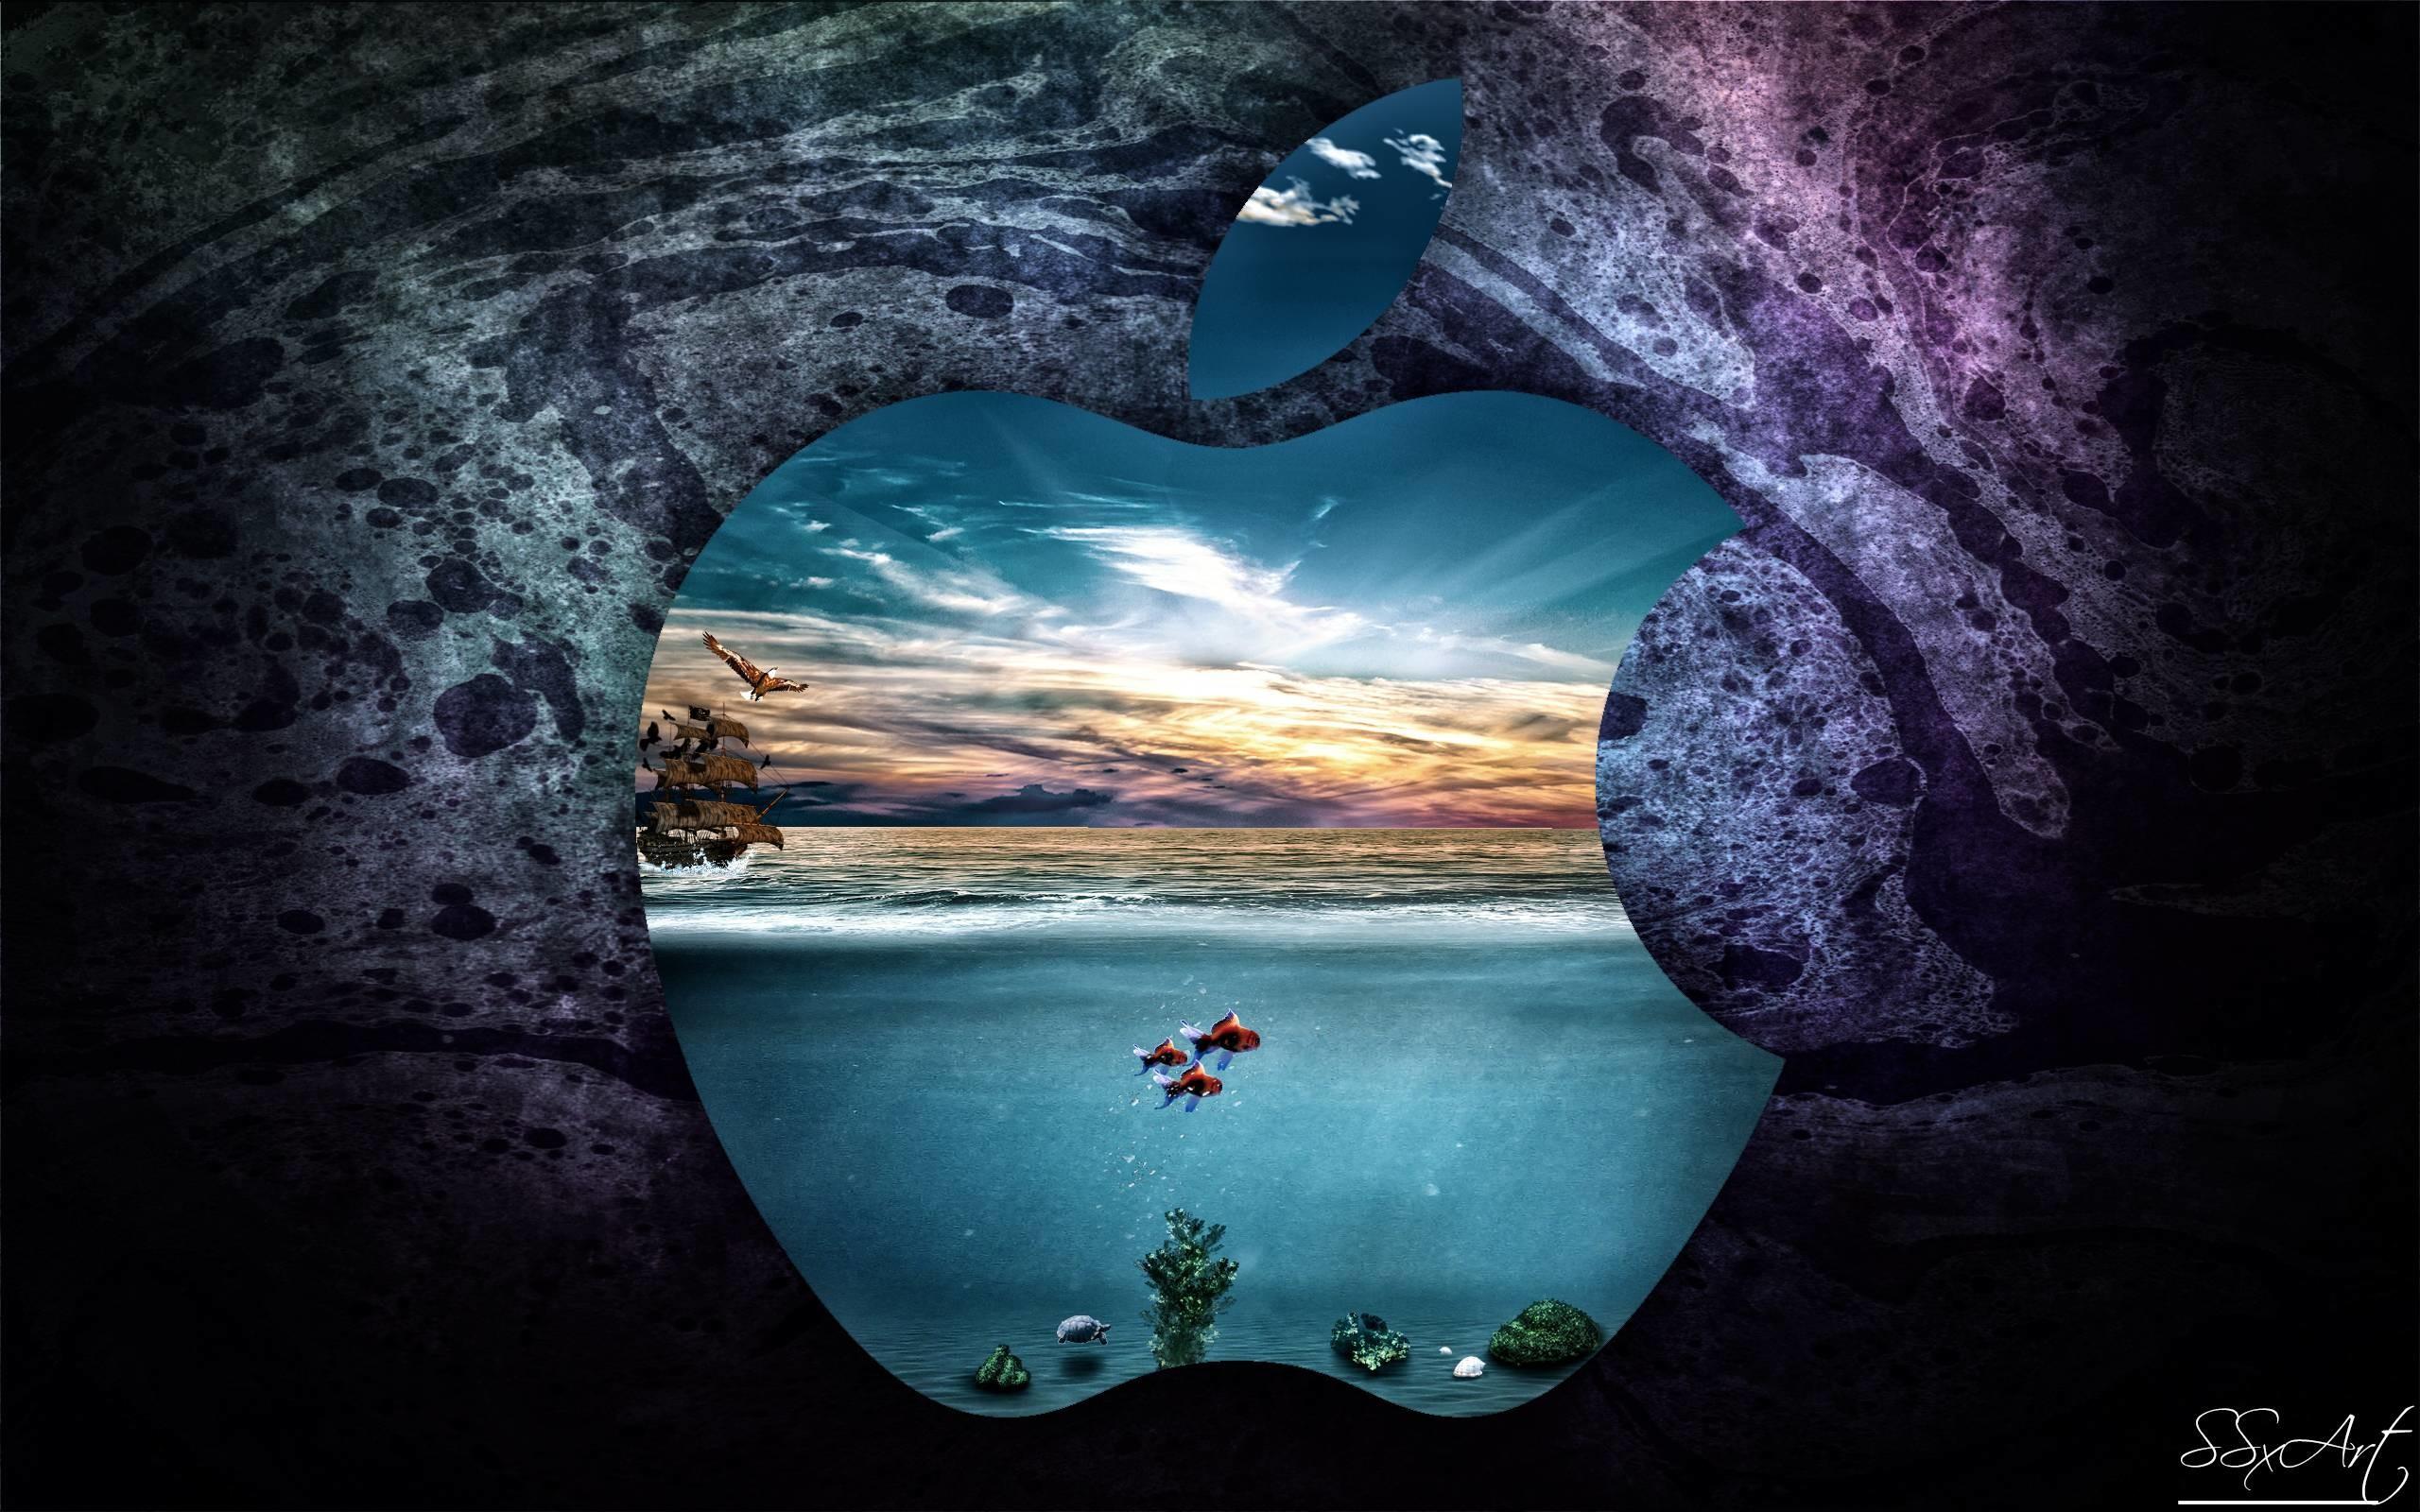 Apple-UnderWater-MacBookPro 13inch Retina display by SSxArt on .